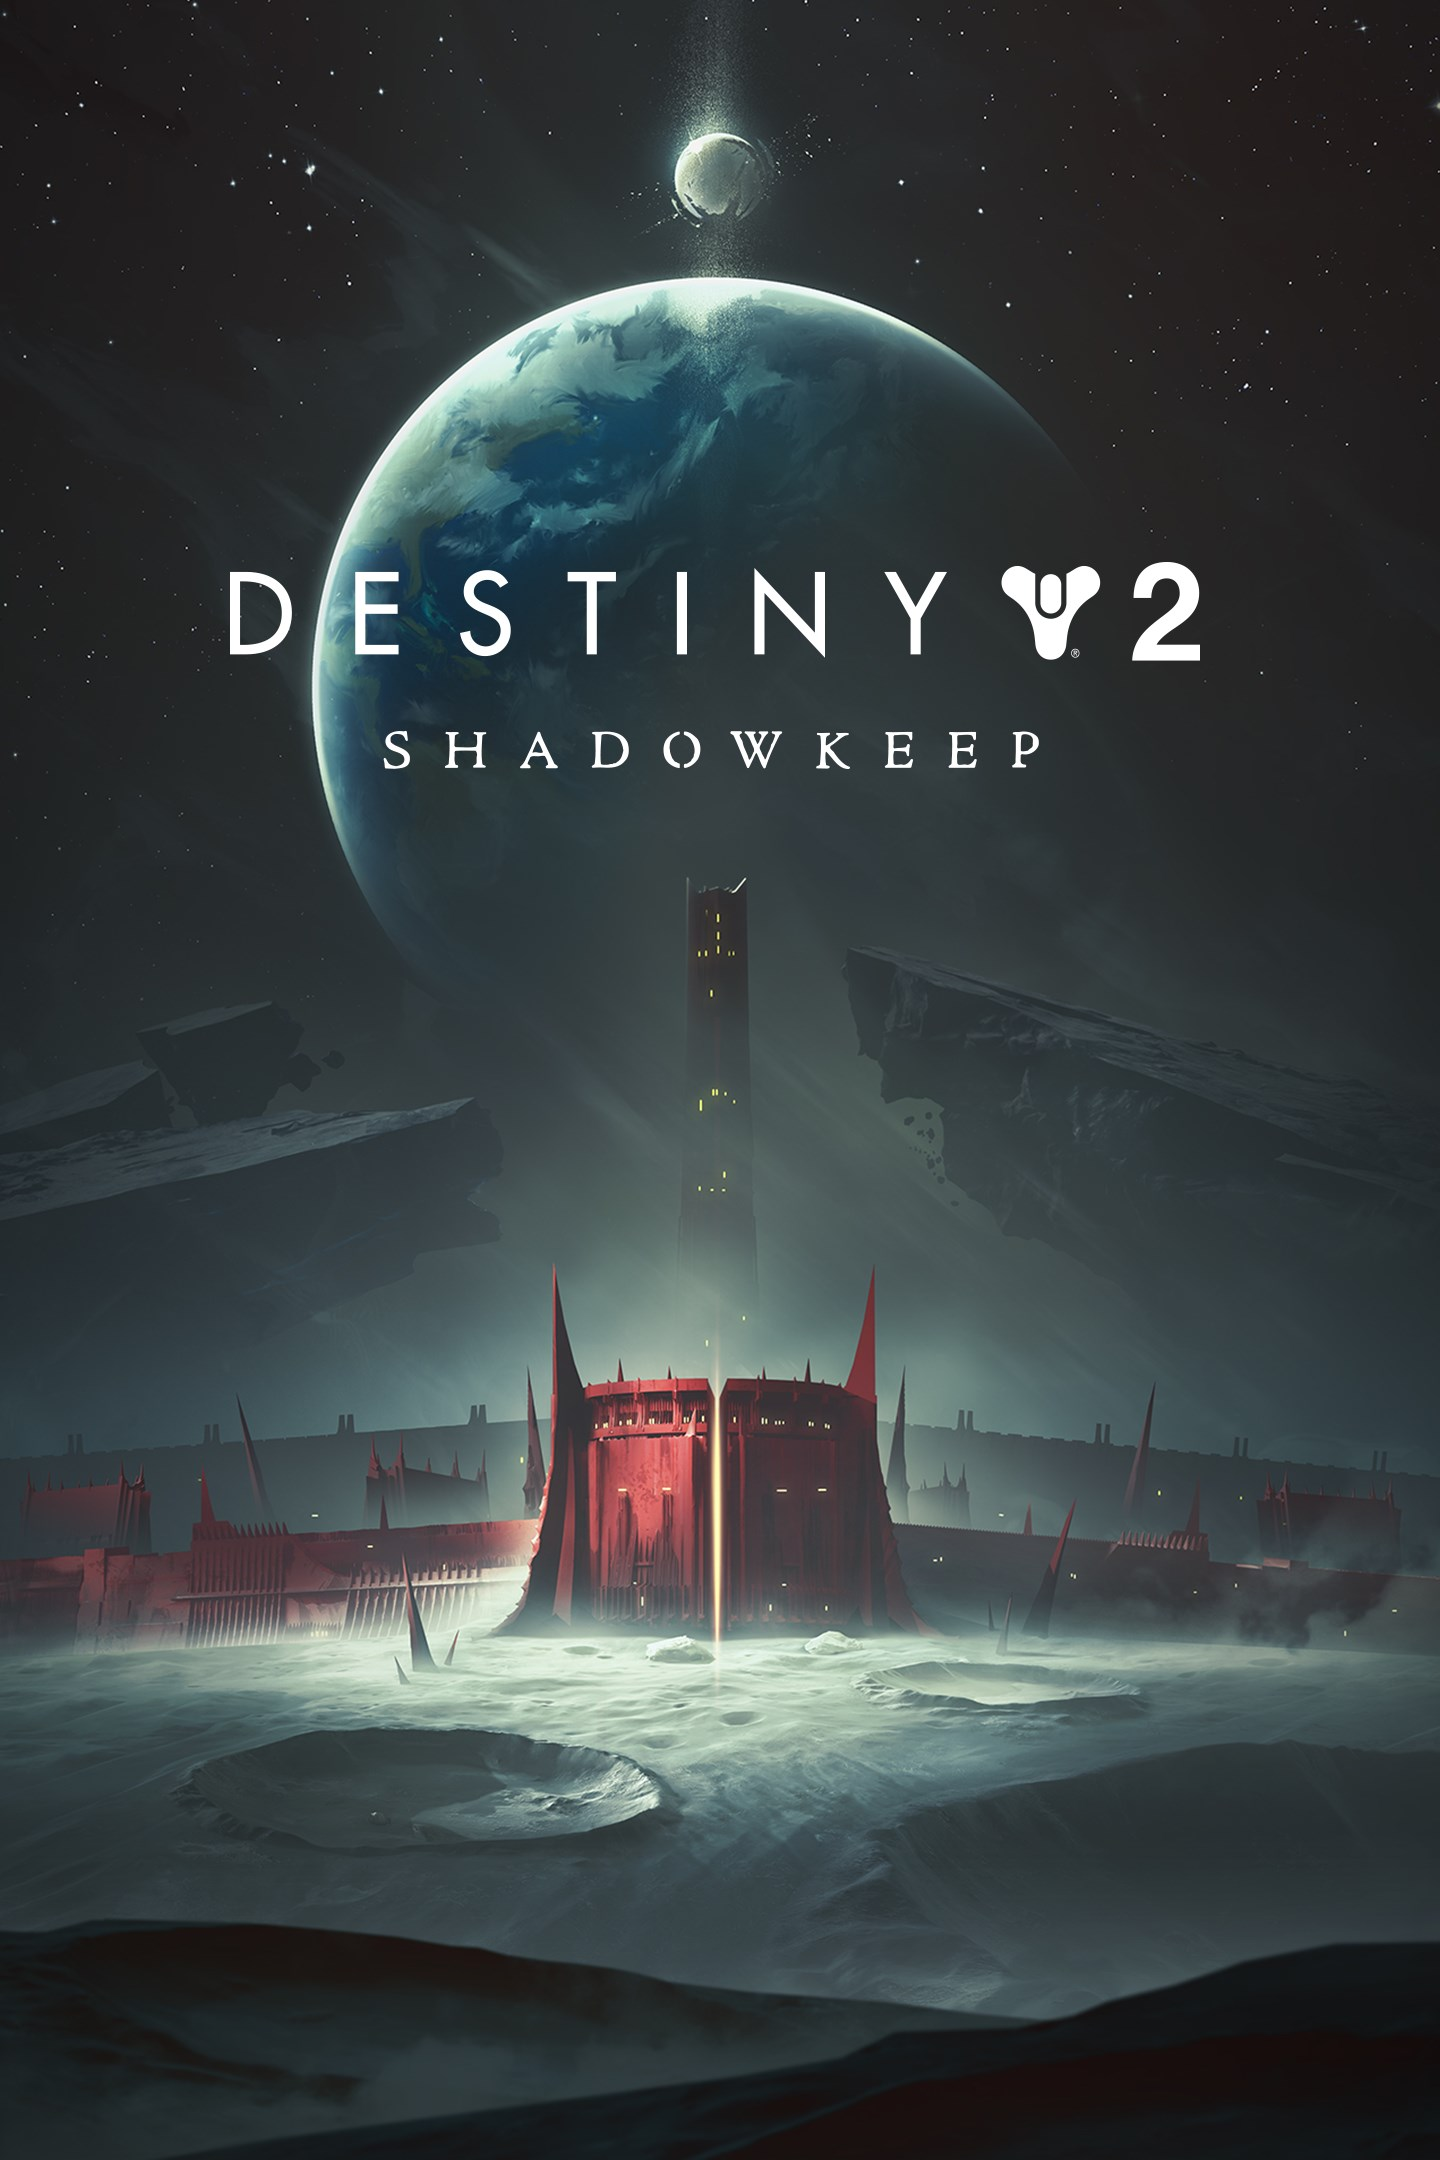 Cover Art for Destiny 2 Shadowkeep.